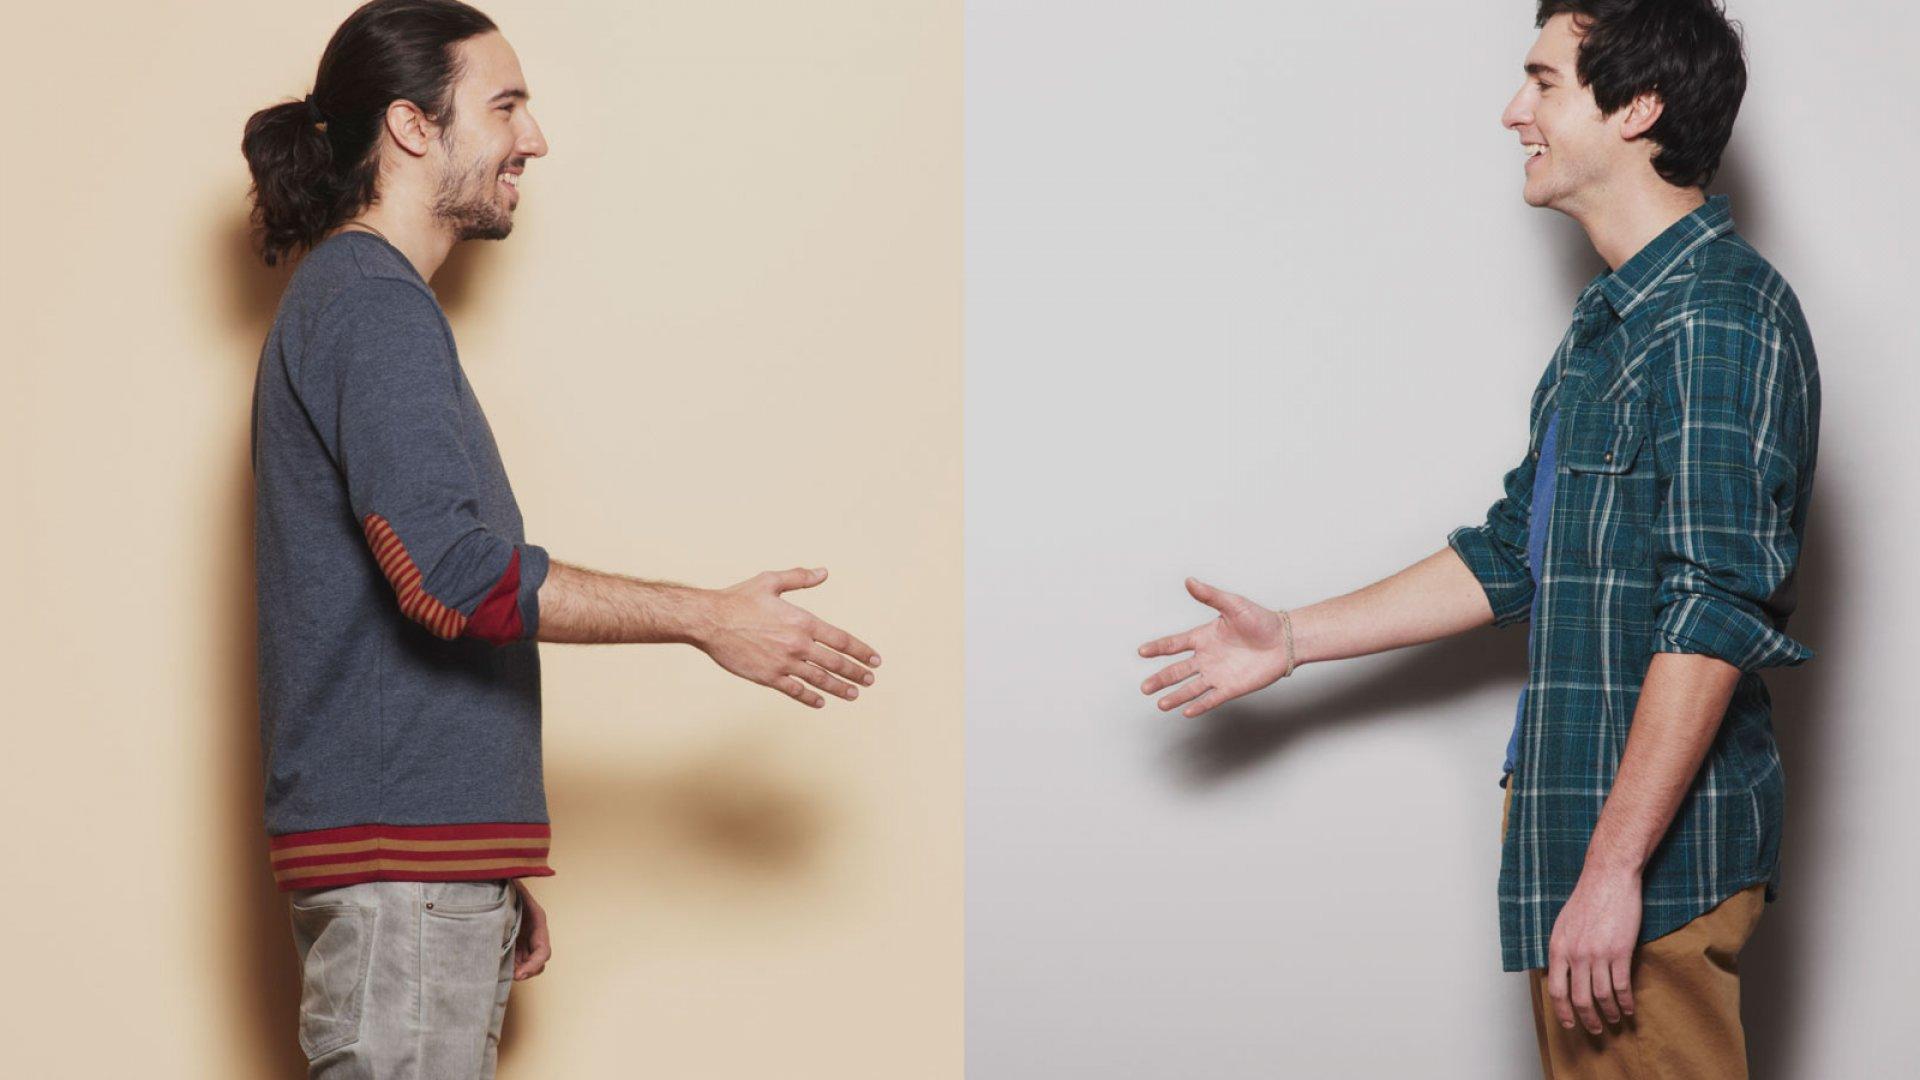 Divining the Secret Language of Handshakes